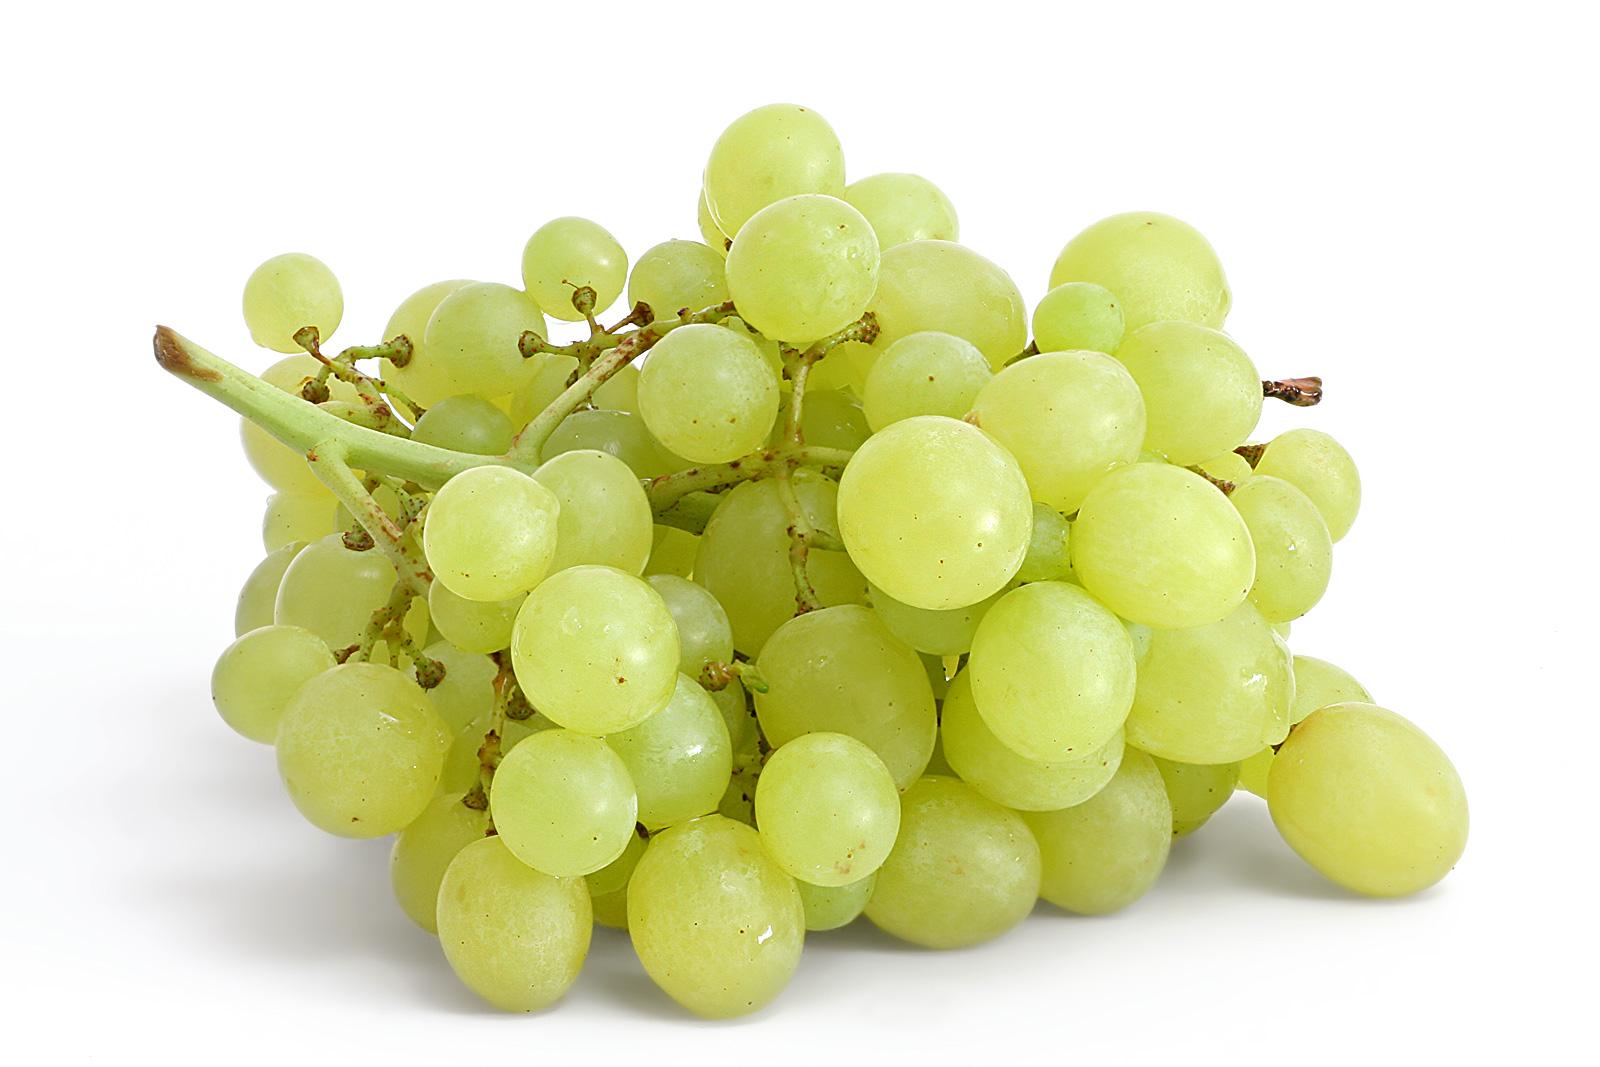 виноград – 18 г